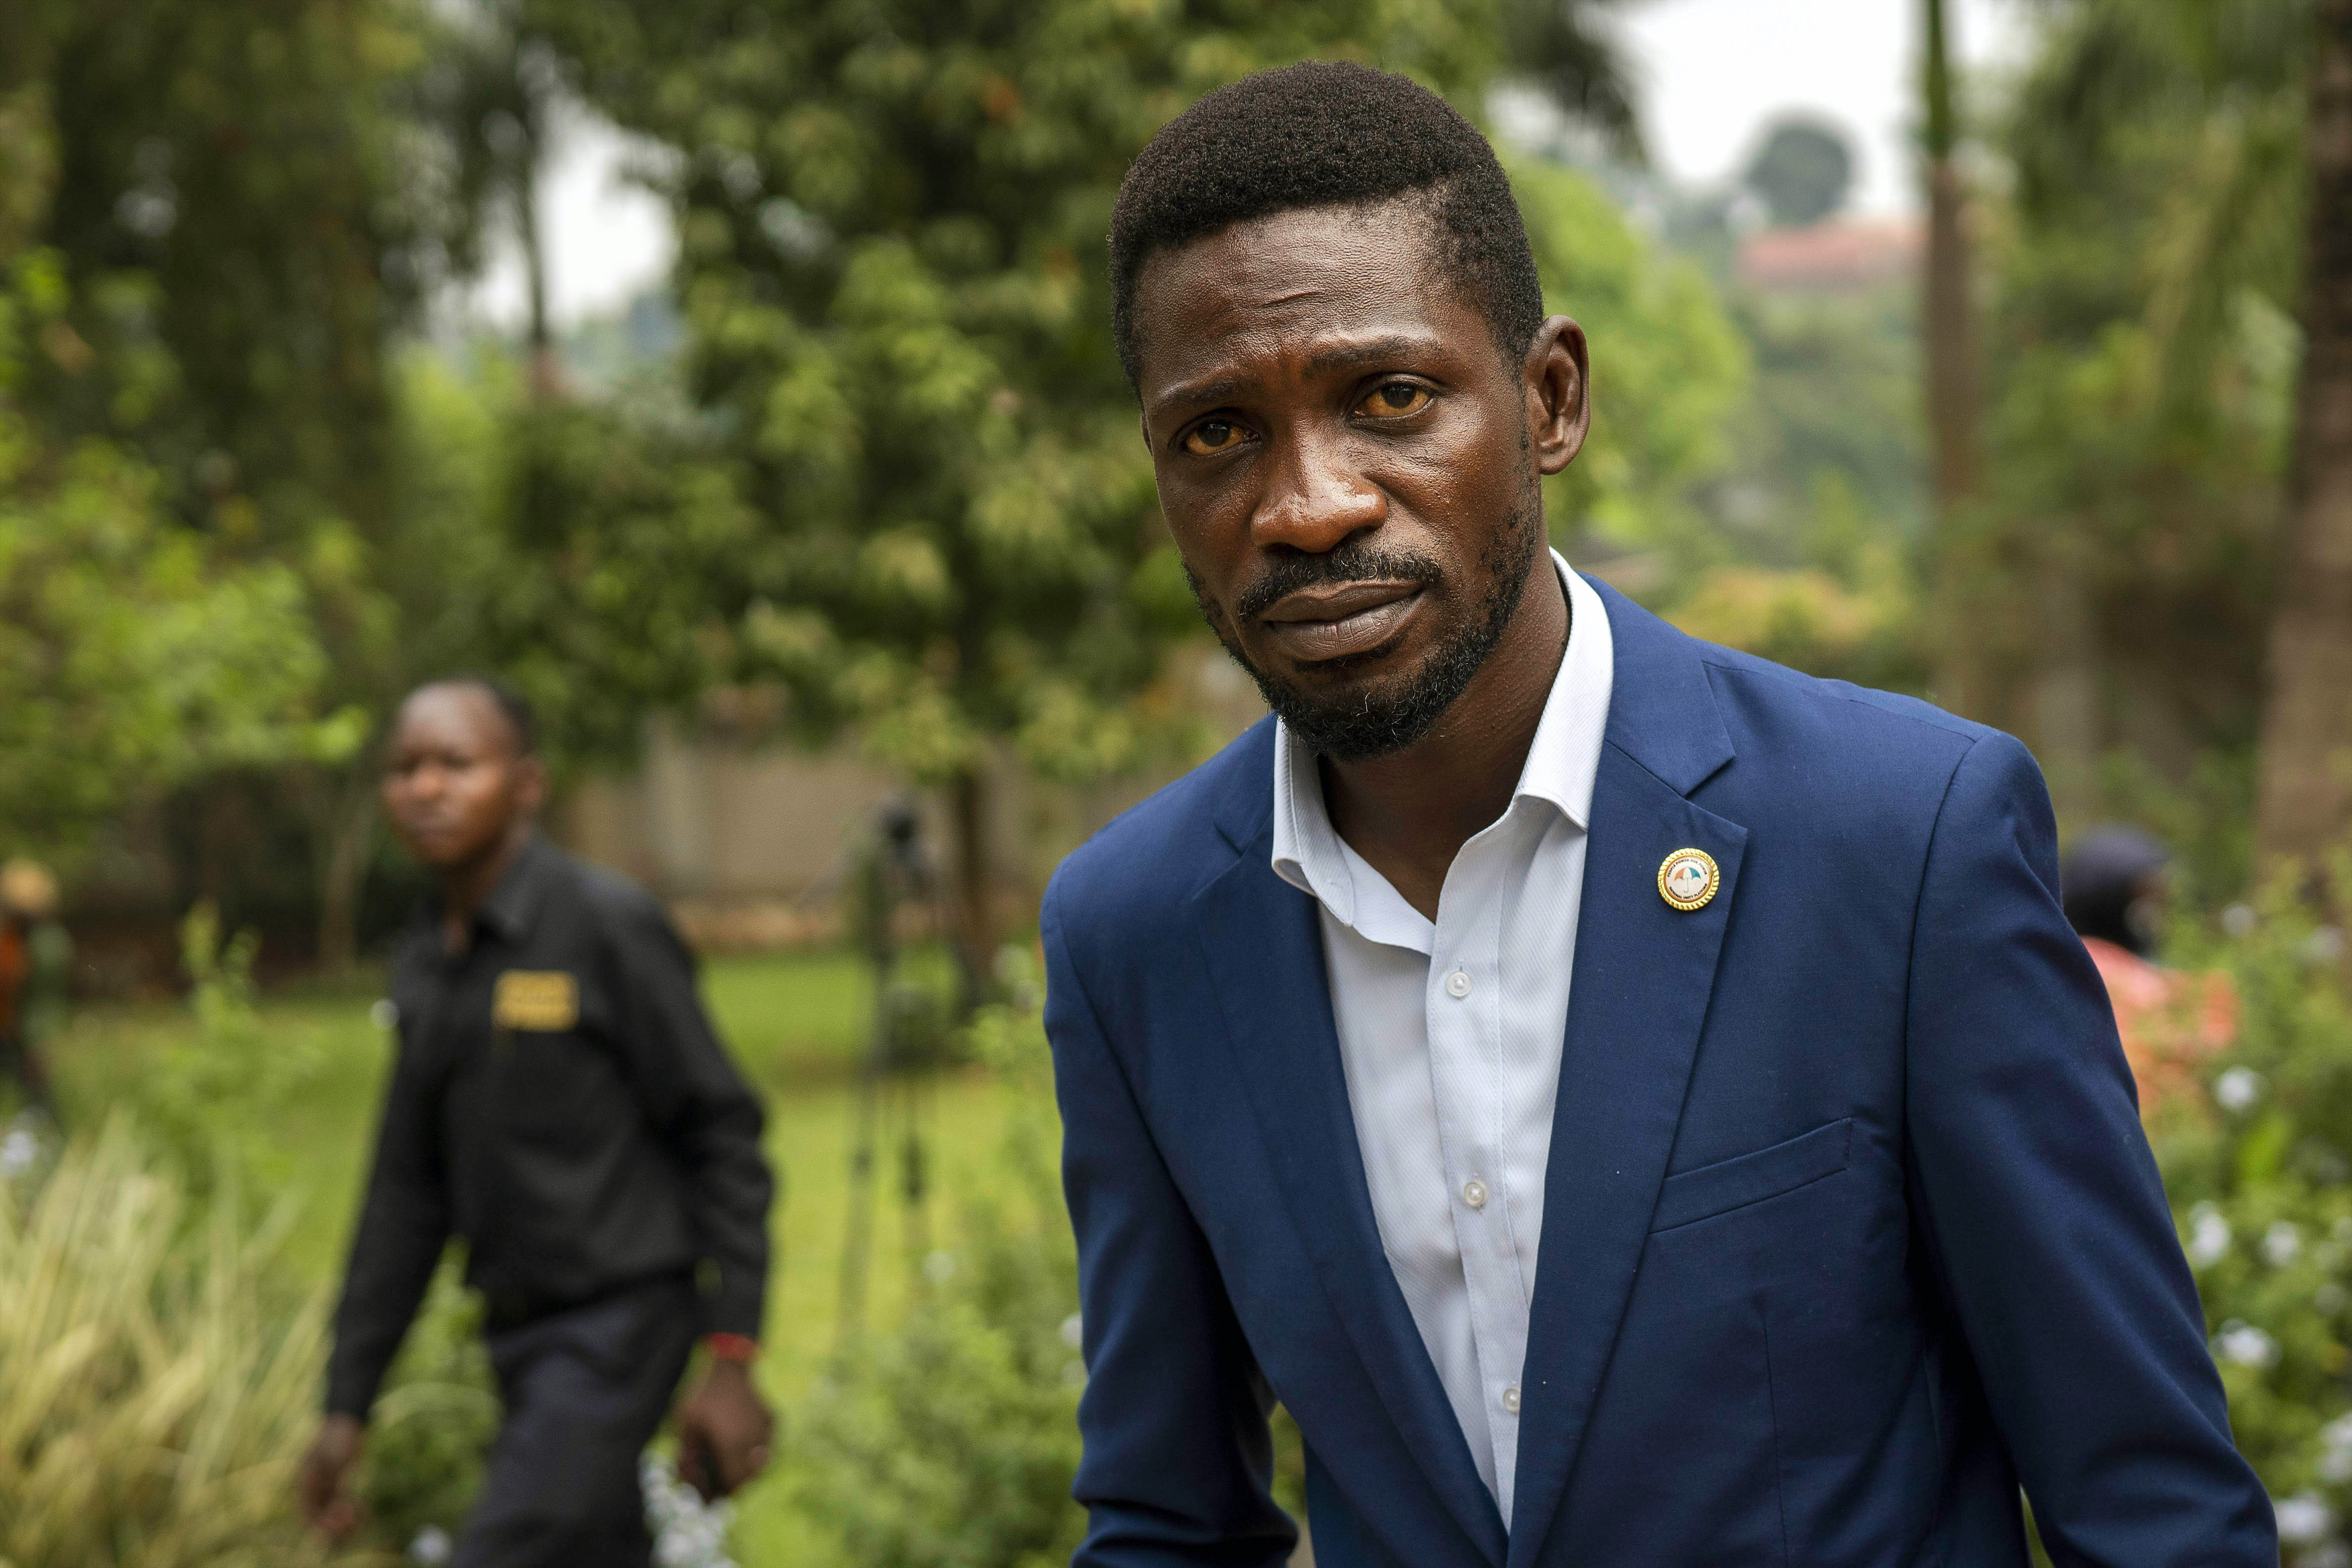 newschainonline.com - The Newsroom - Uganda's Bobi Wine wins growing power despite loss in disputed election